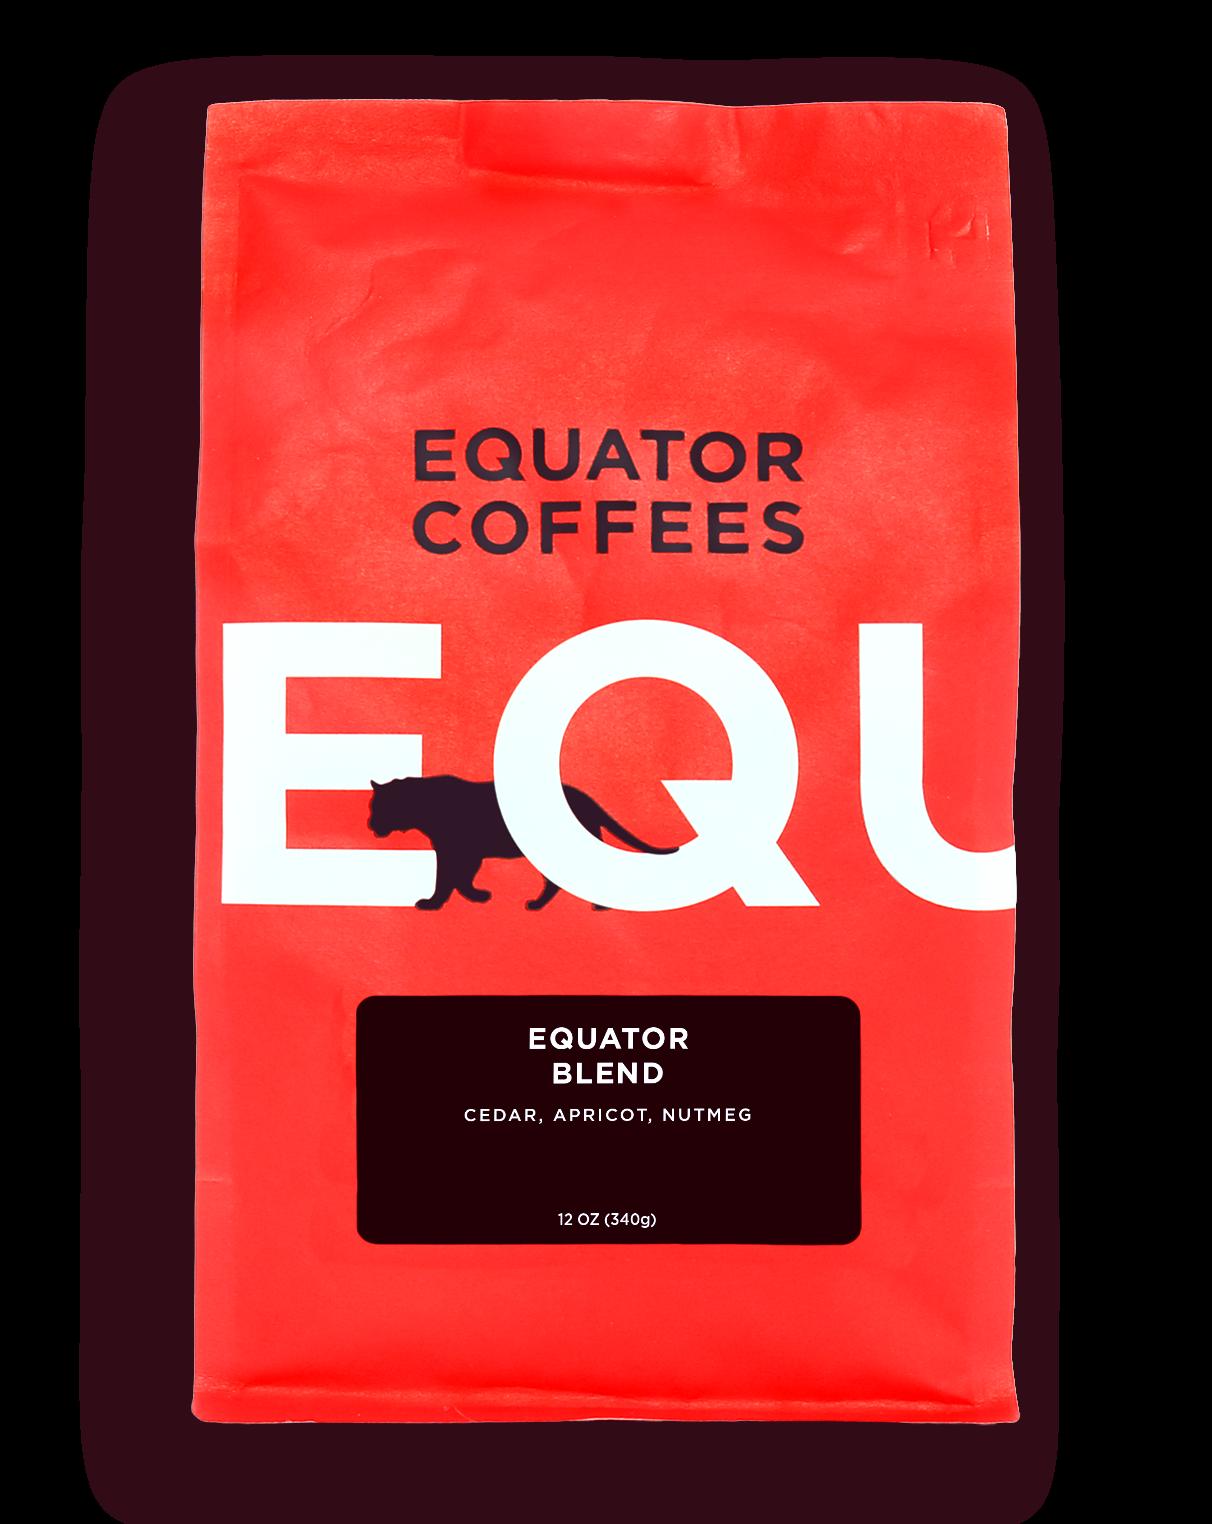 Equator Coffees photo